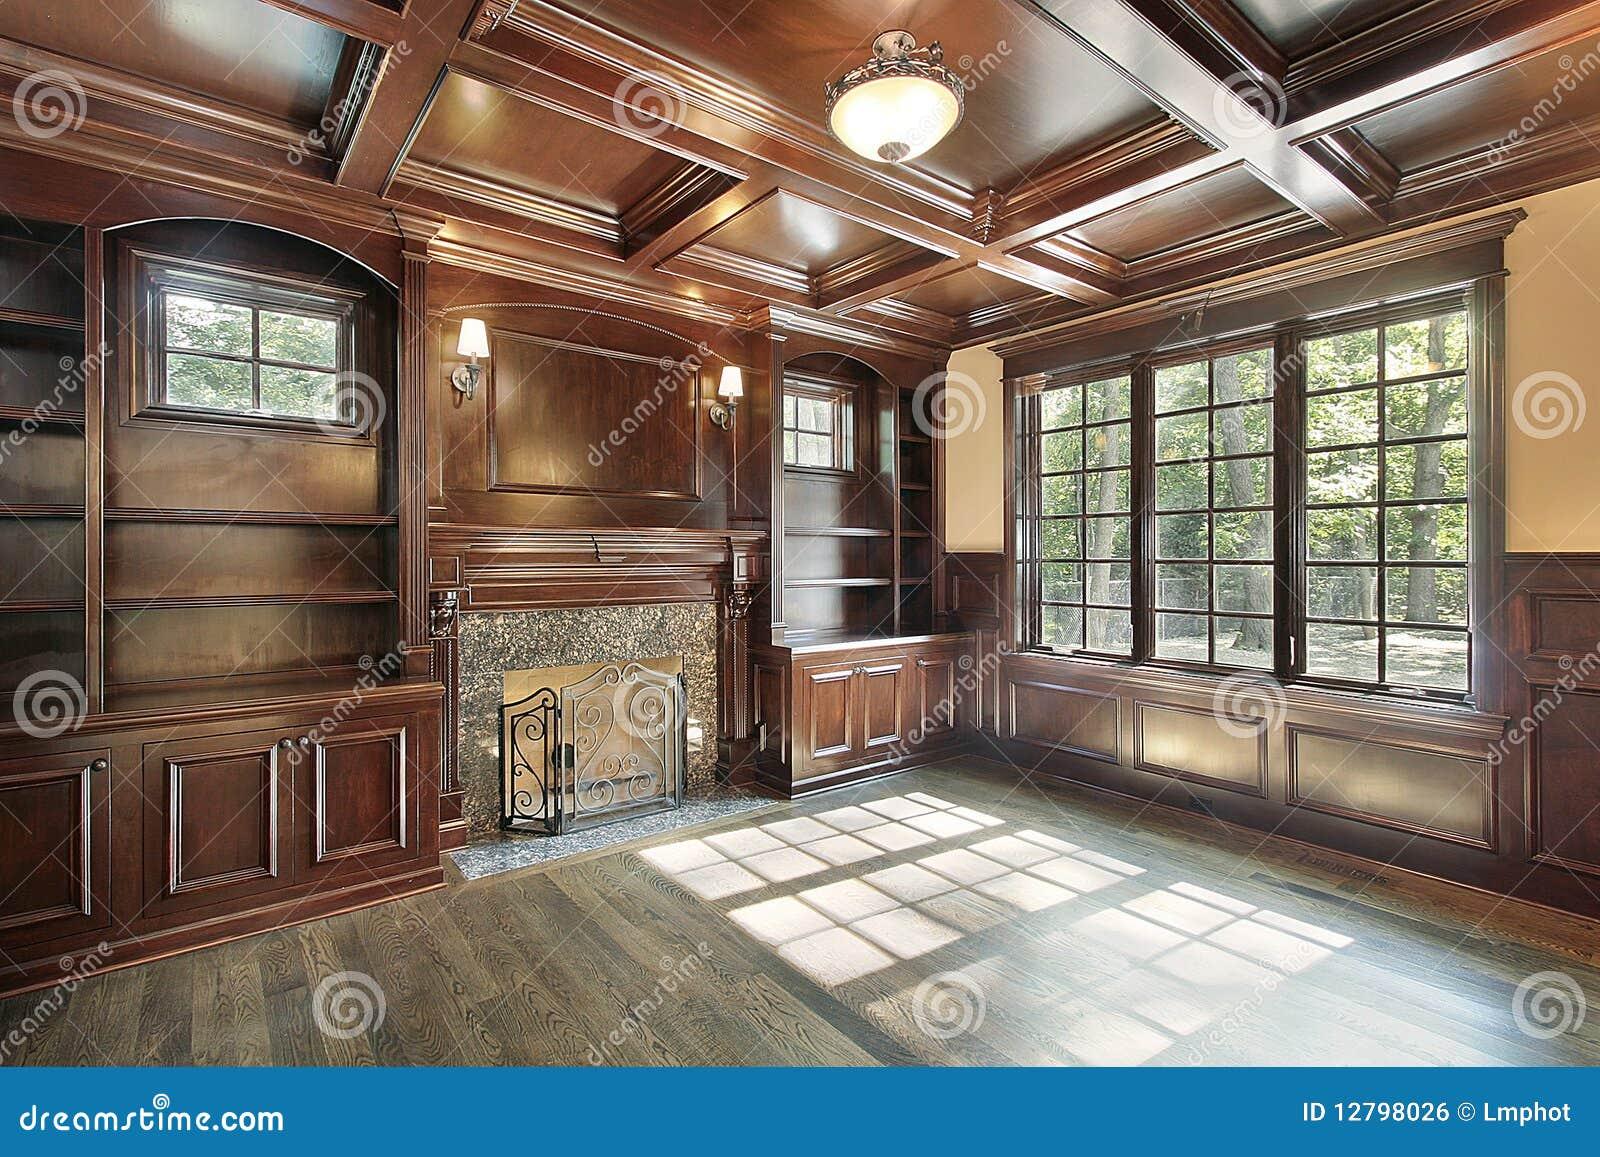 biblioth que avec la chemin e image libre de droits image 12798026. Black Bedroom Furniture Sets. Home Design Ideas